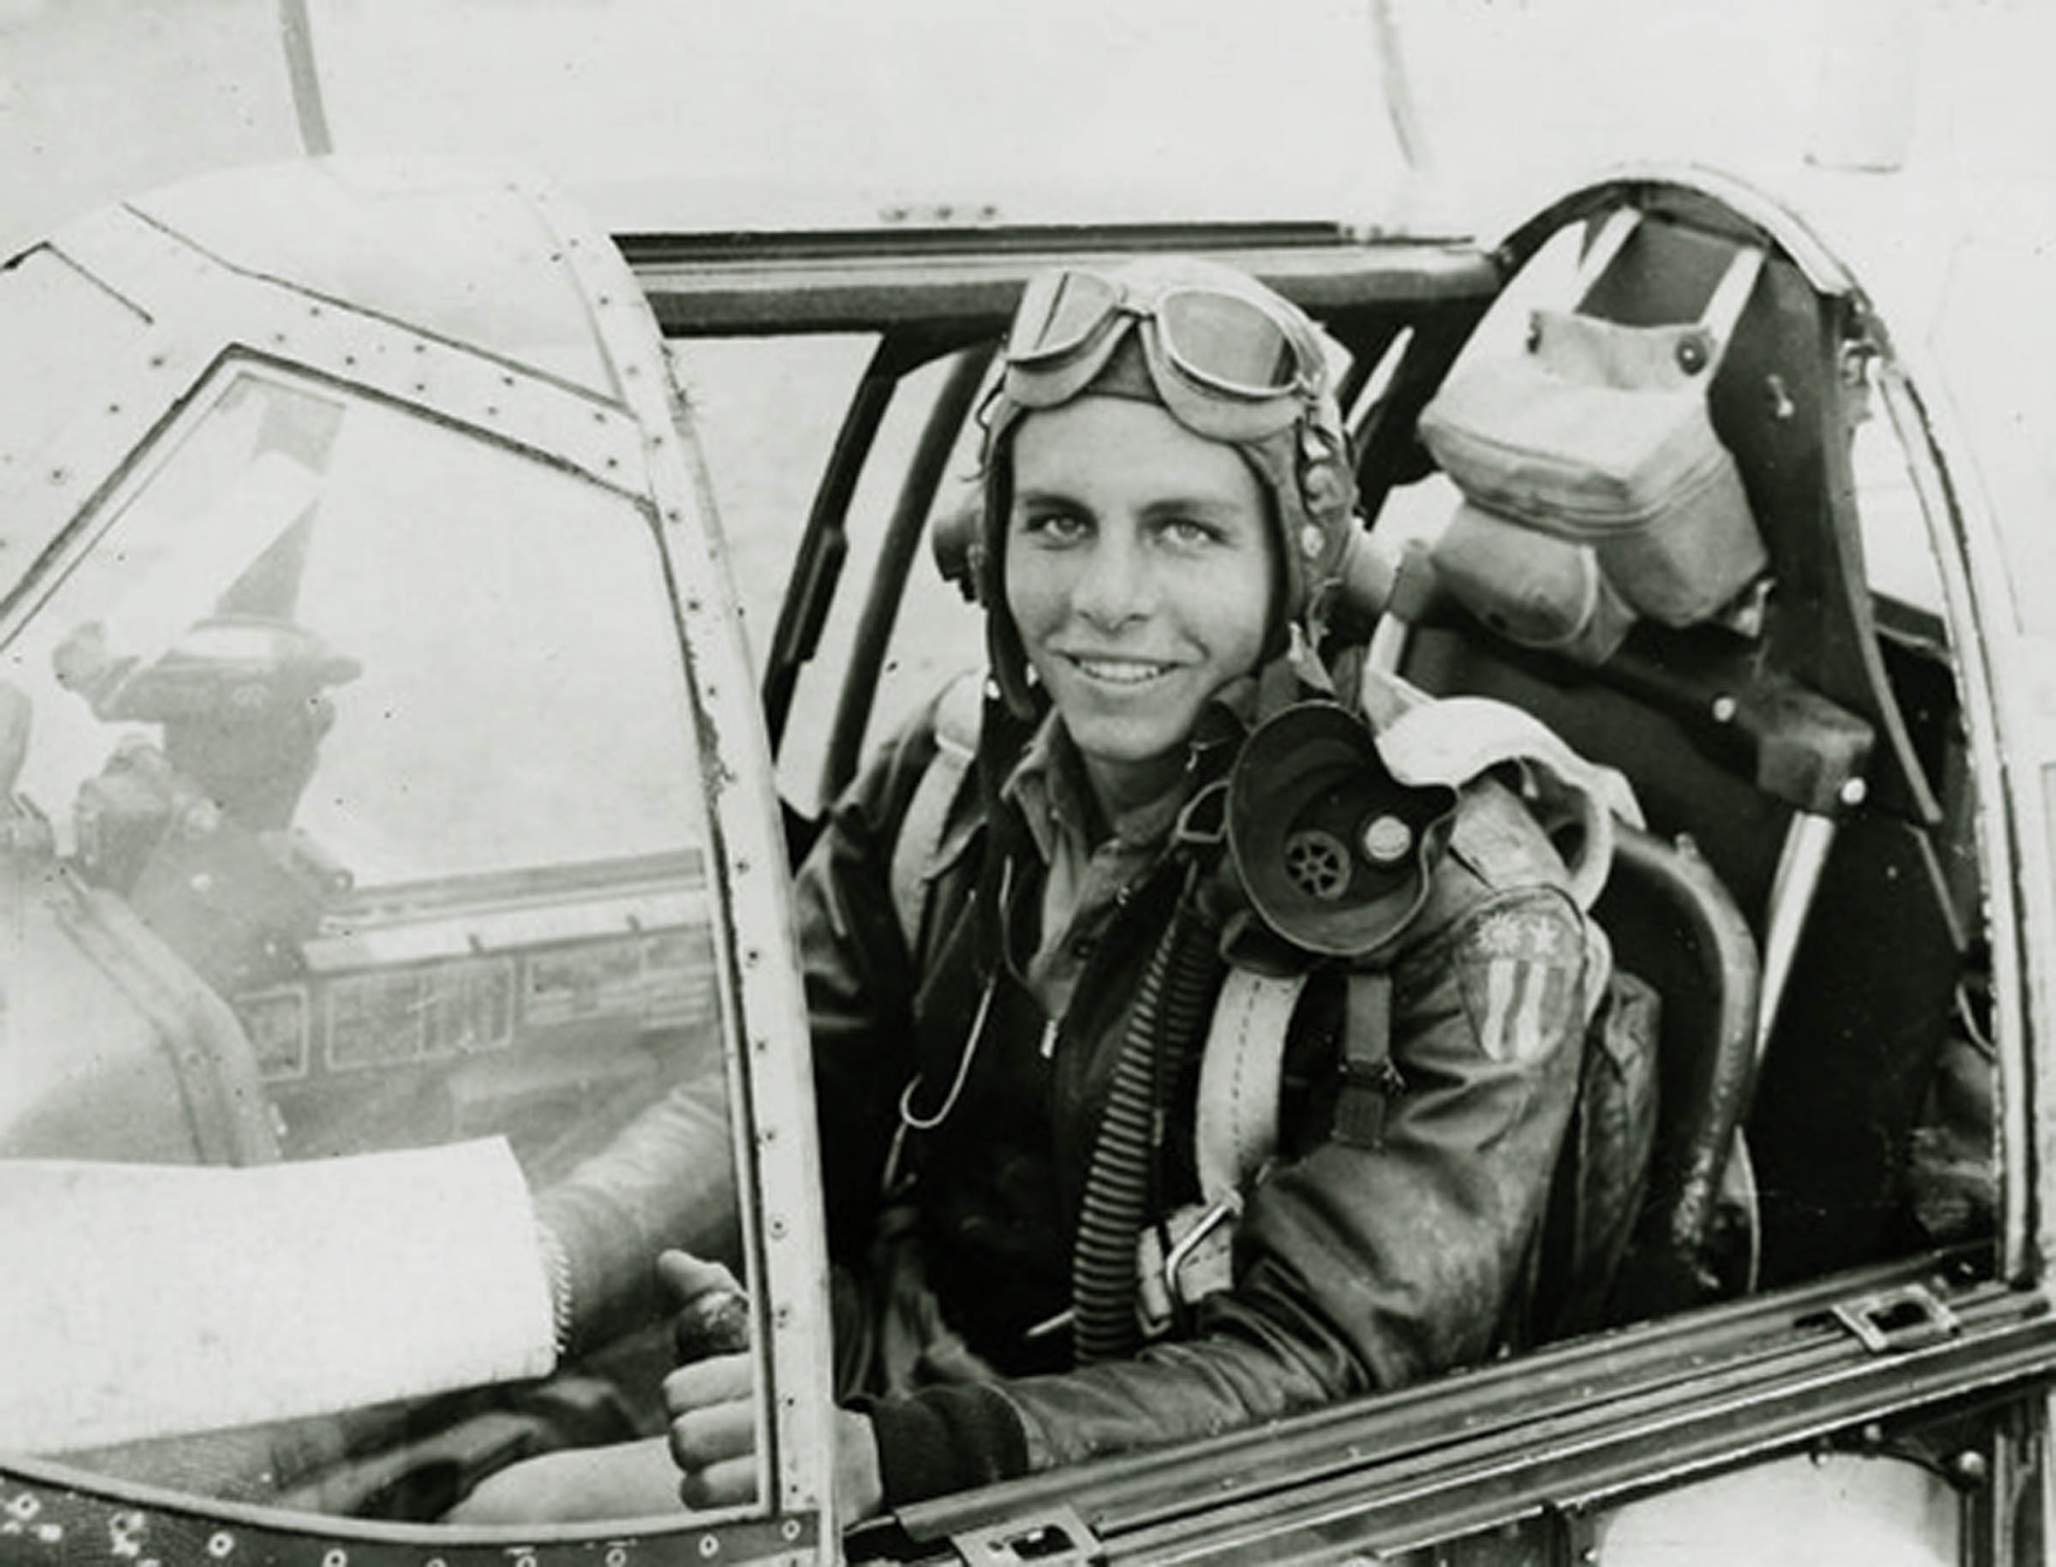 us aeronautical first aid kit